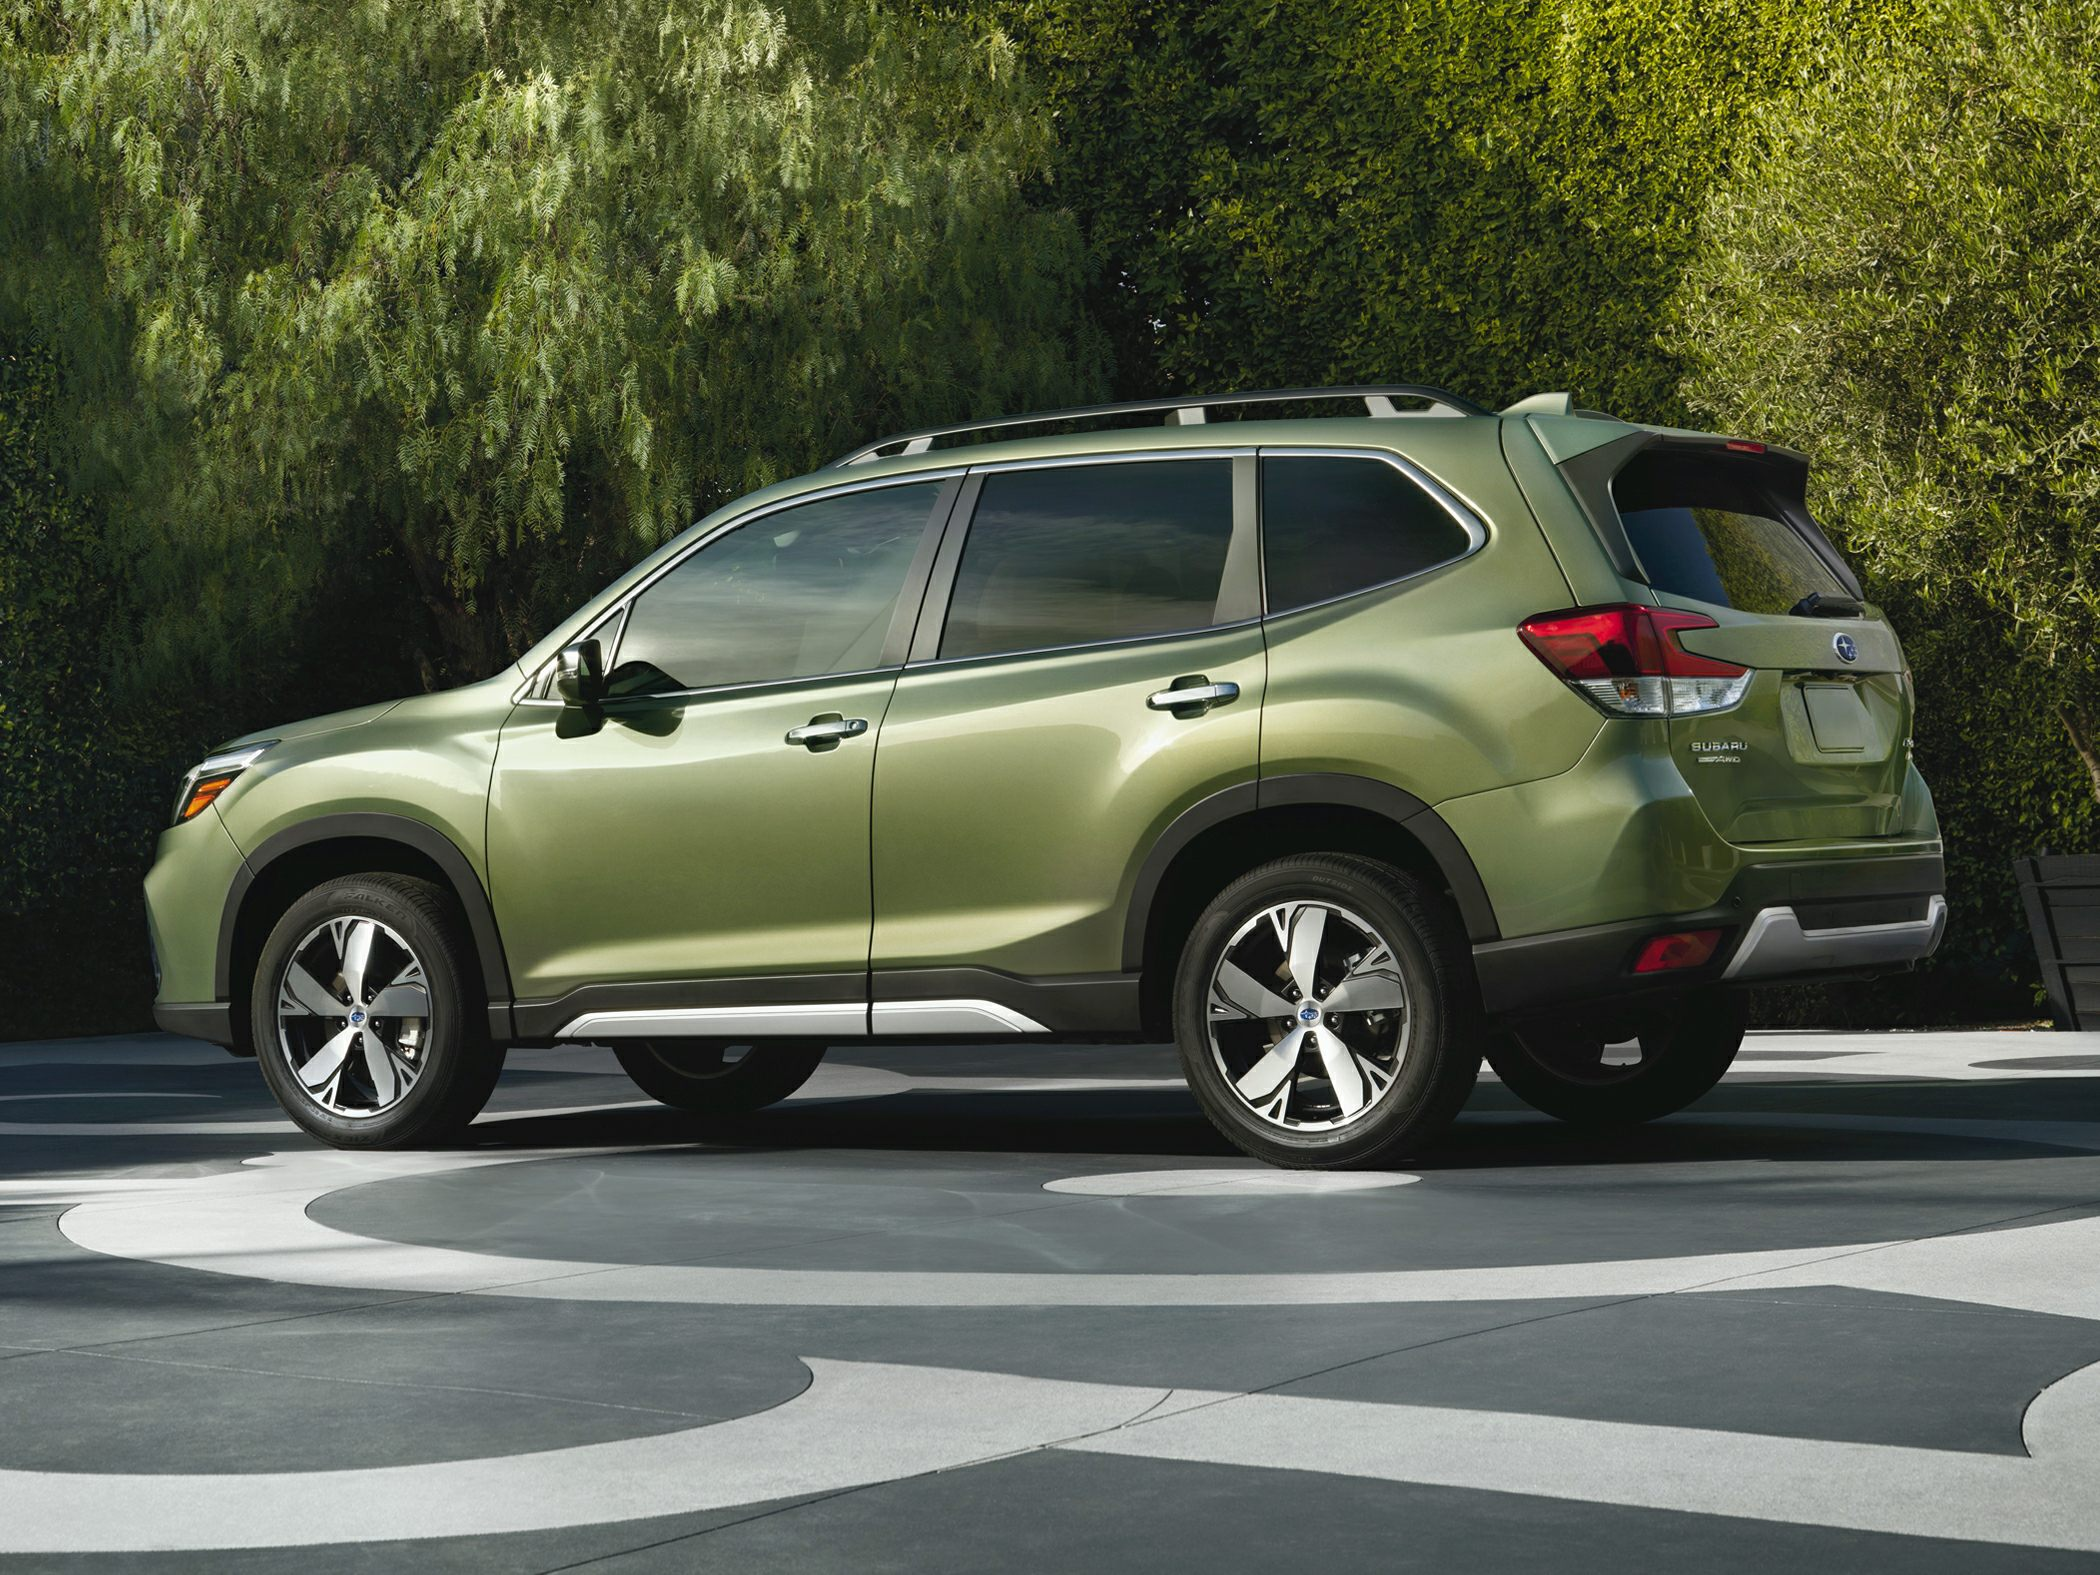 Oem Exterior 2019 Subaru Forester